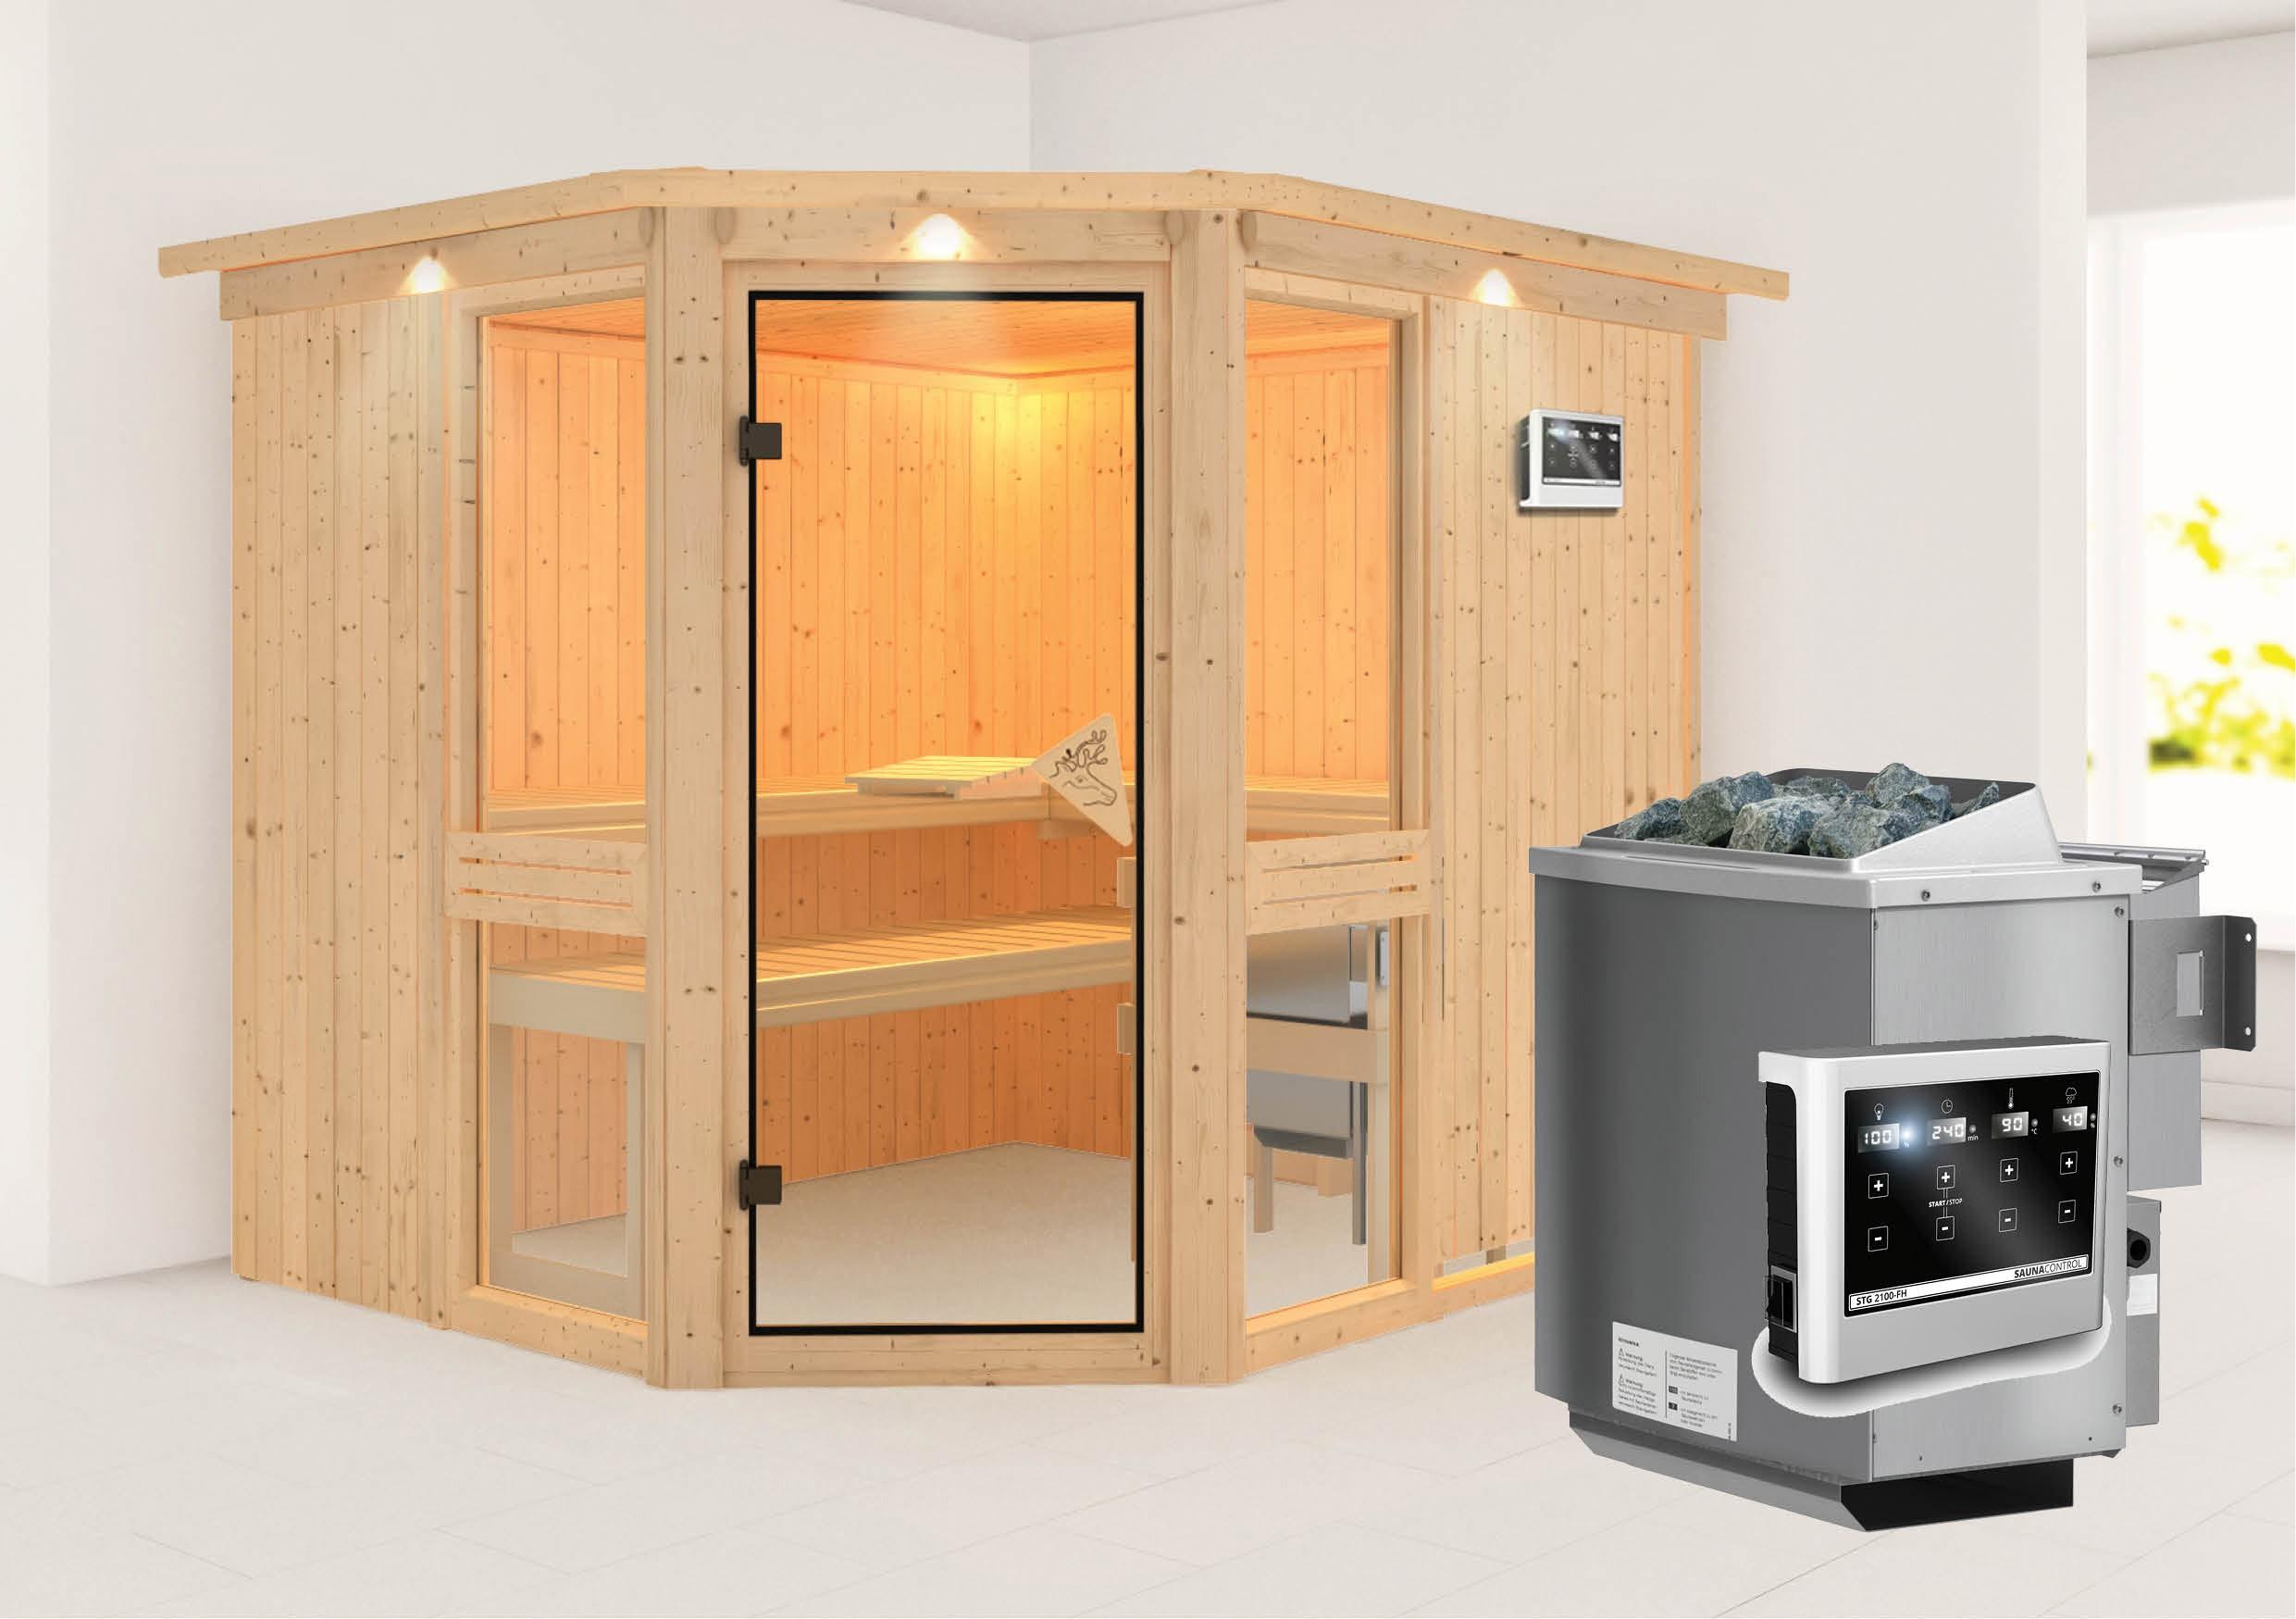 karibu sauna amelia3 68mm dachkranz bio ofen 9kw extern classic t r bei. Black Bedroom Furniture Sets. Home Design Ideas